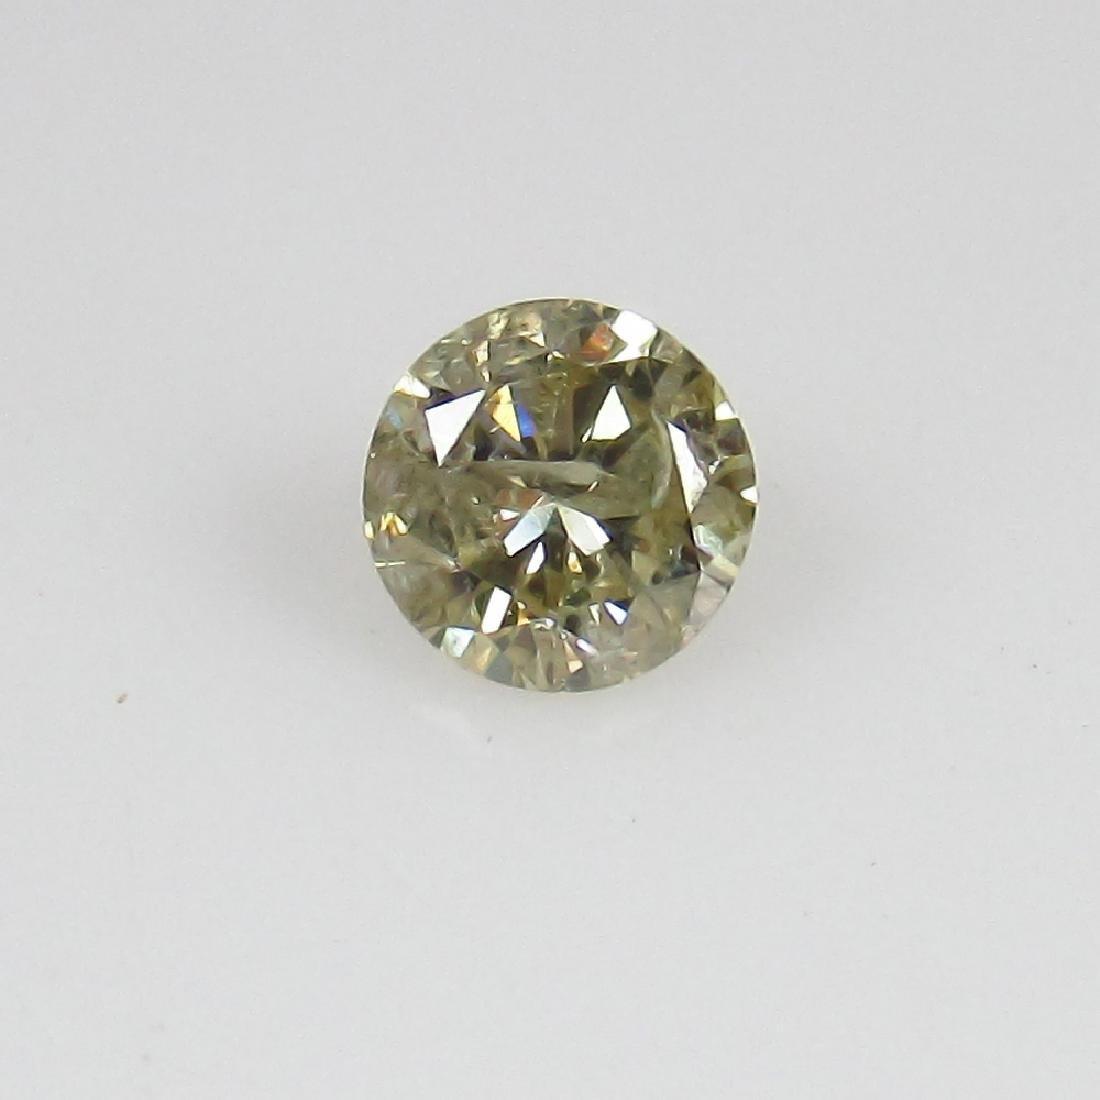 0.18 Ct Genuine Loose Diamond 3.7 mm Round Cut